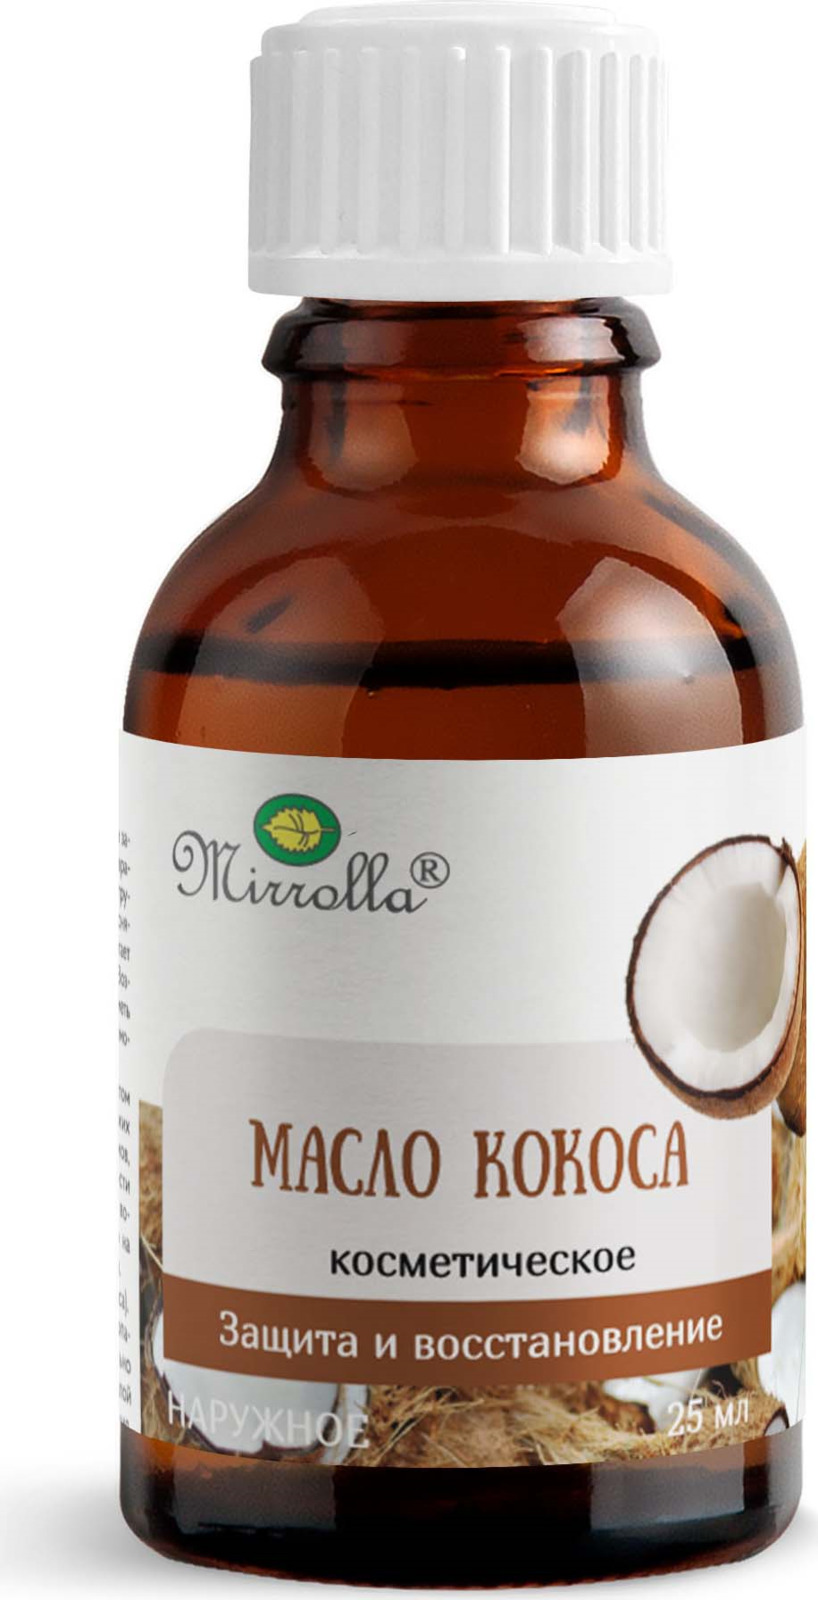 Масло кокоса Mirrolla, косметическое, 25 мл масло кокоса mirrolla косметическое 25 мл